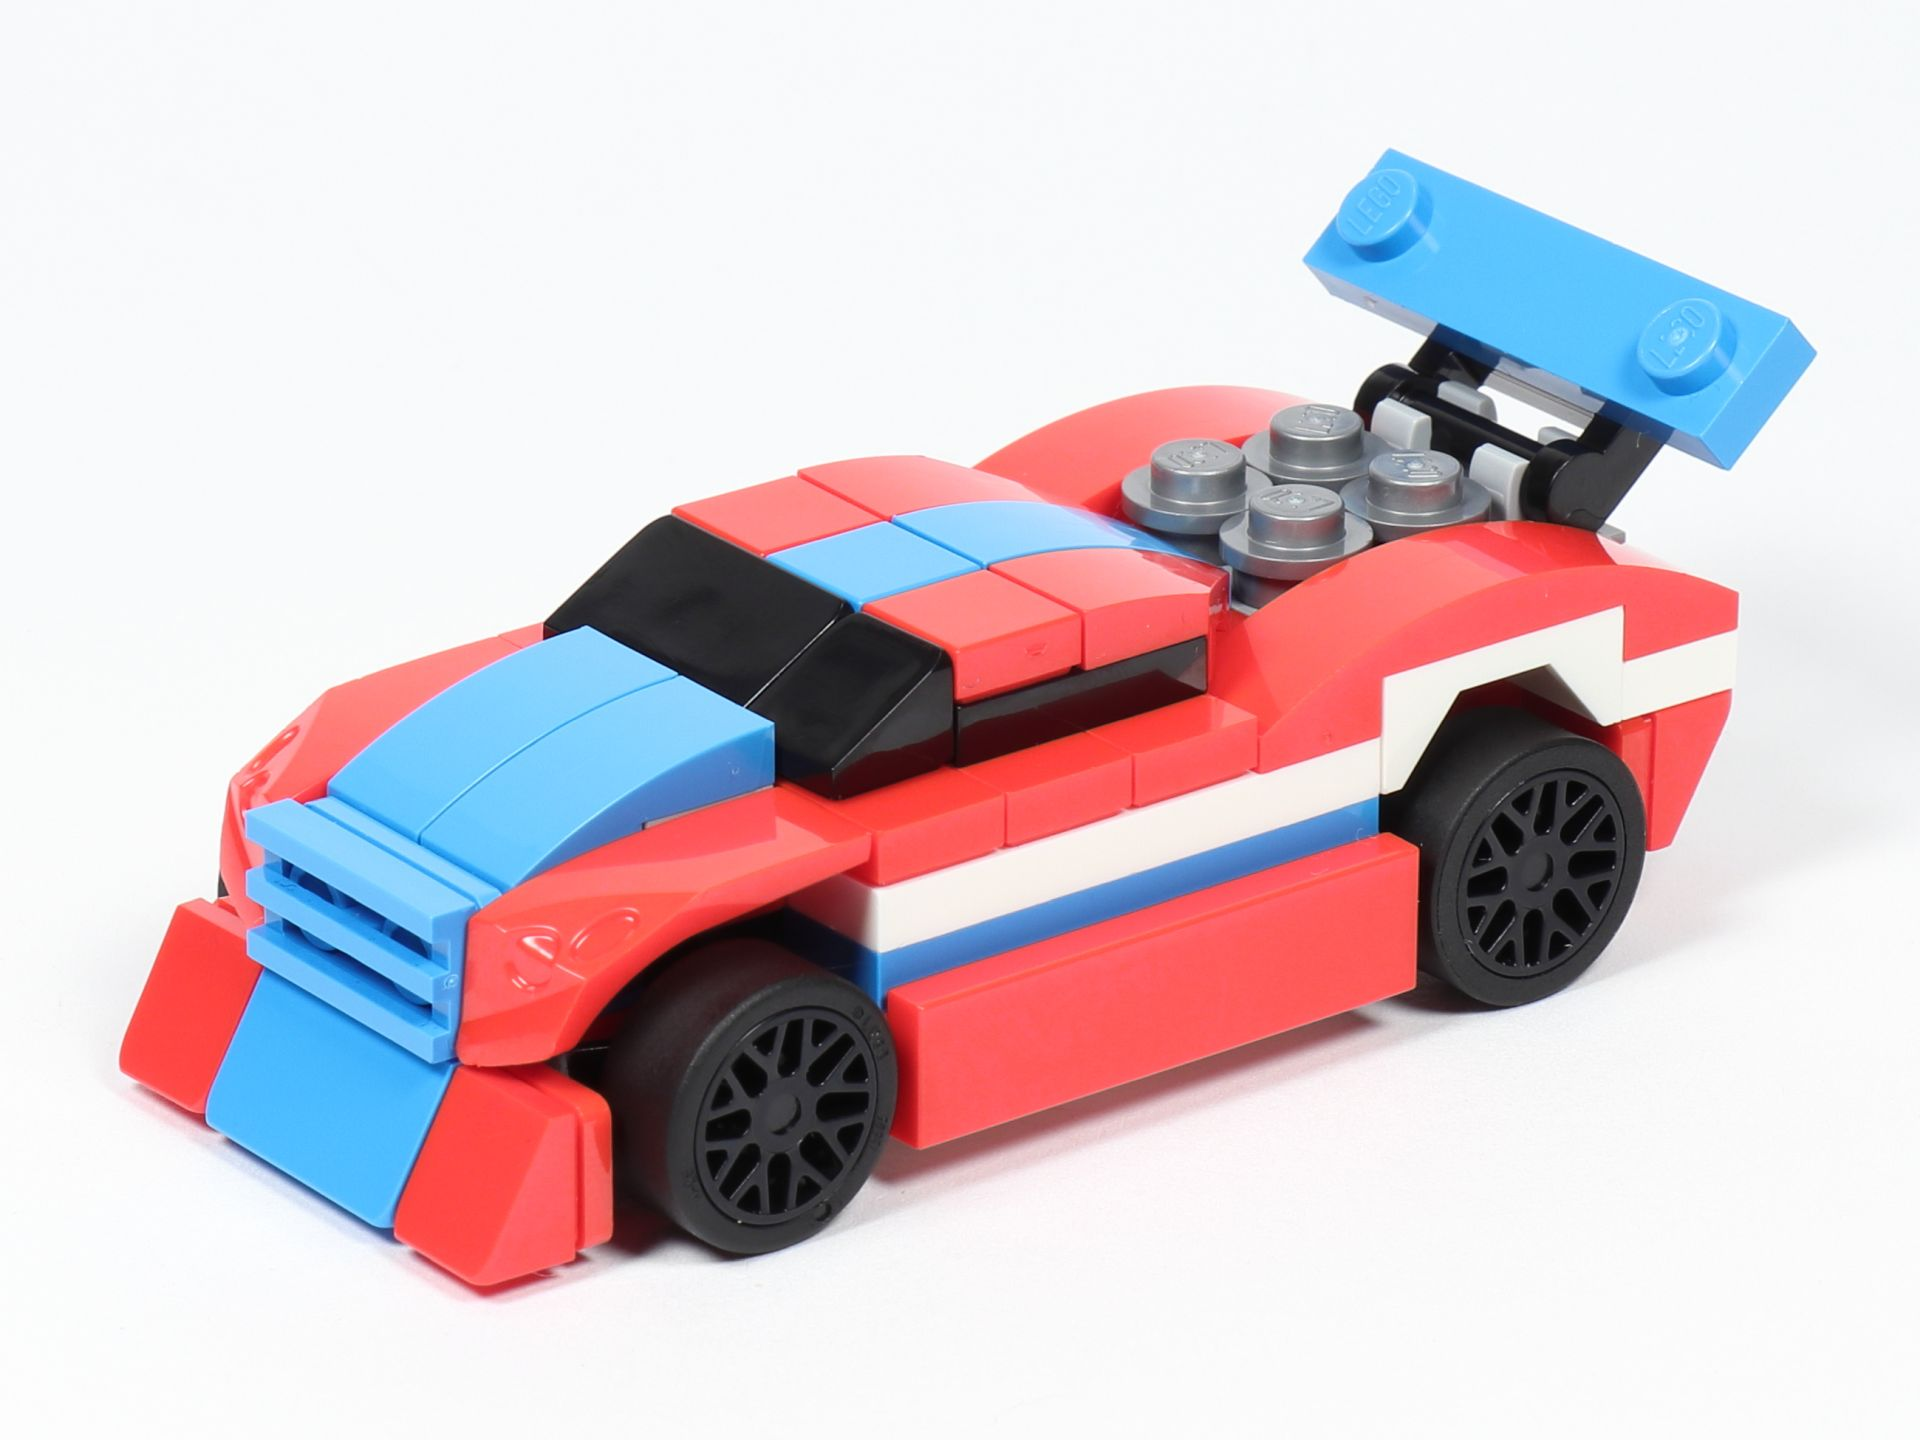 Review Lego Creator 30572 Rennauto Polybag Brickzeit